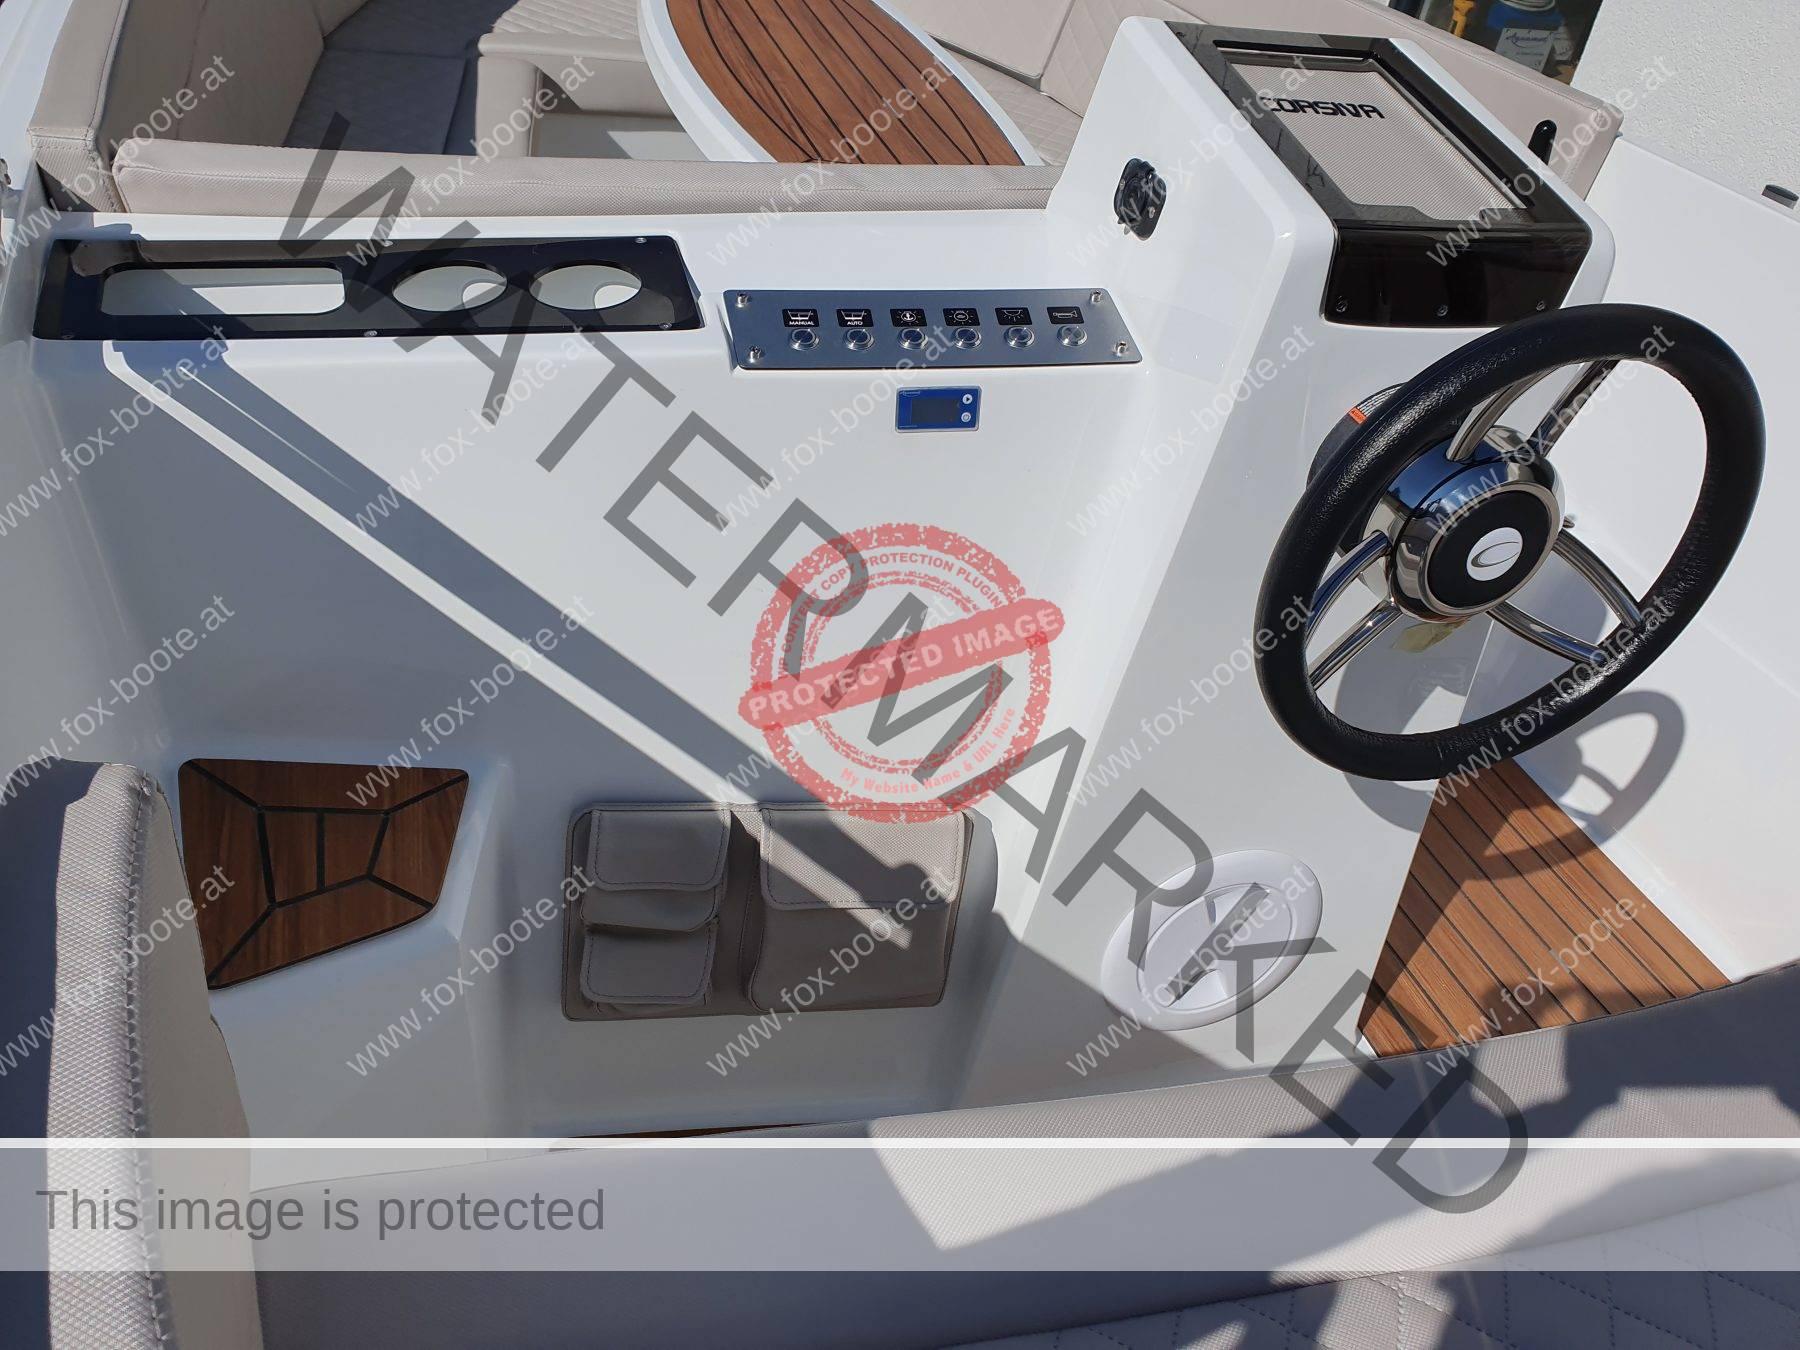 corsiva 595 tender 28